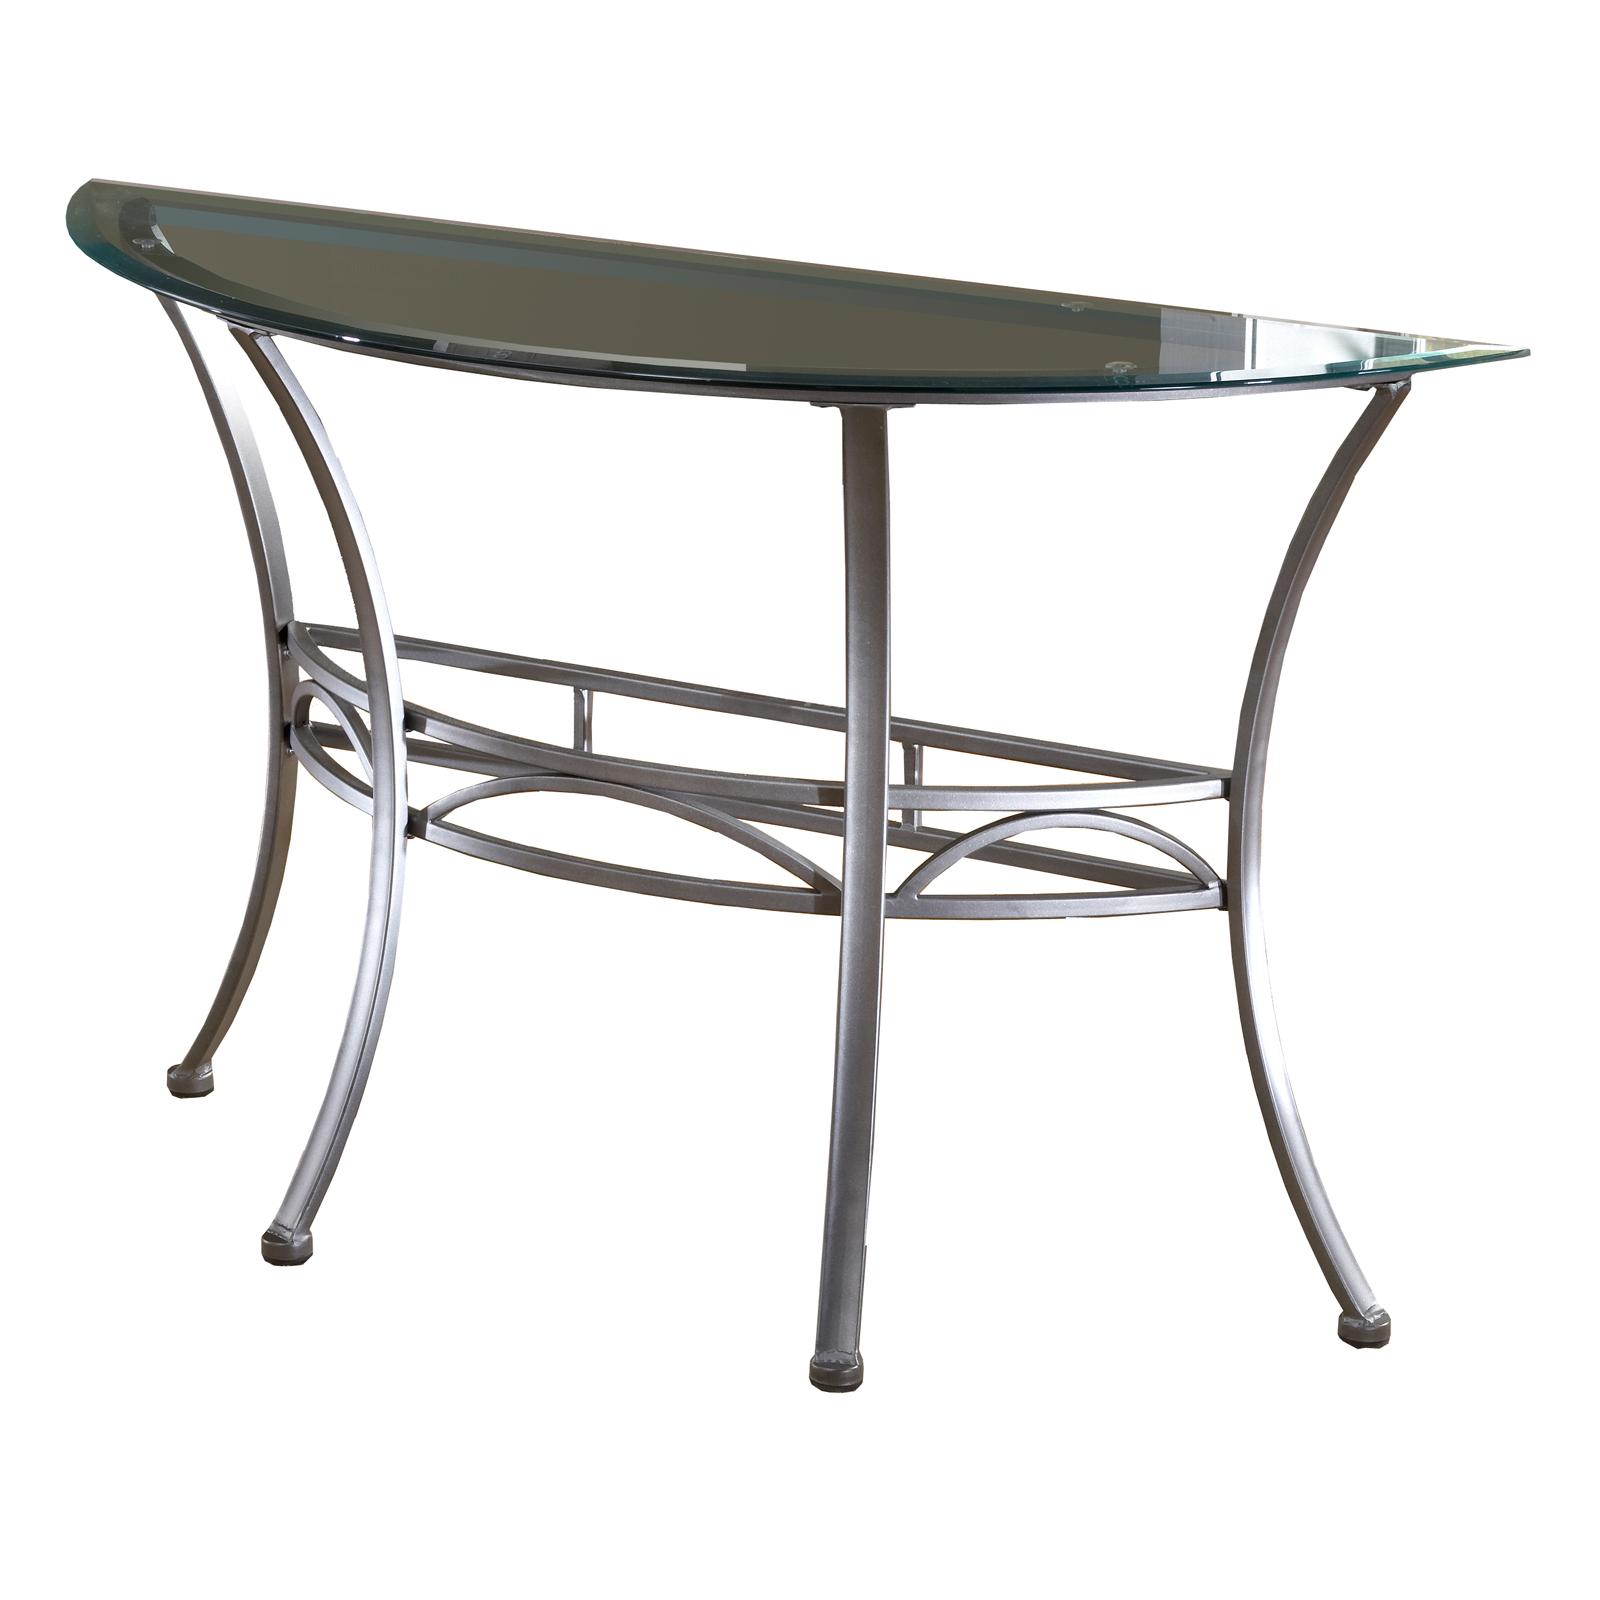 sofa set glass table ikea couch au hillsdale top